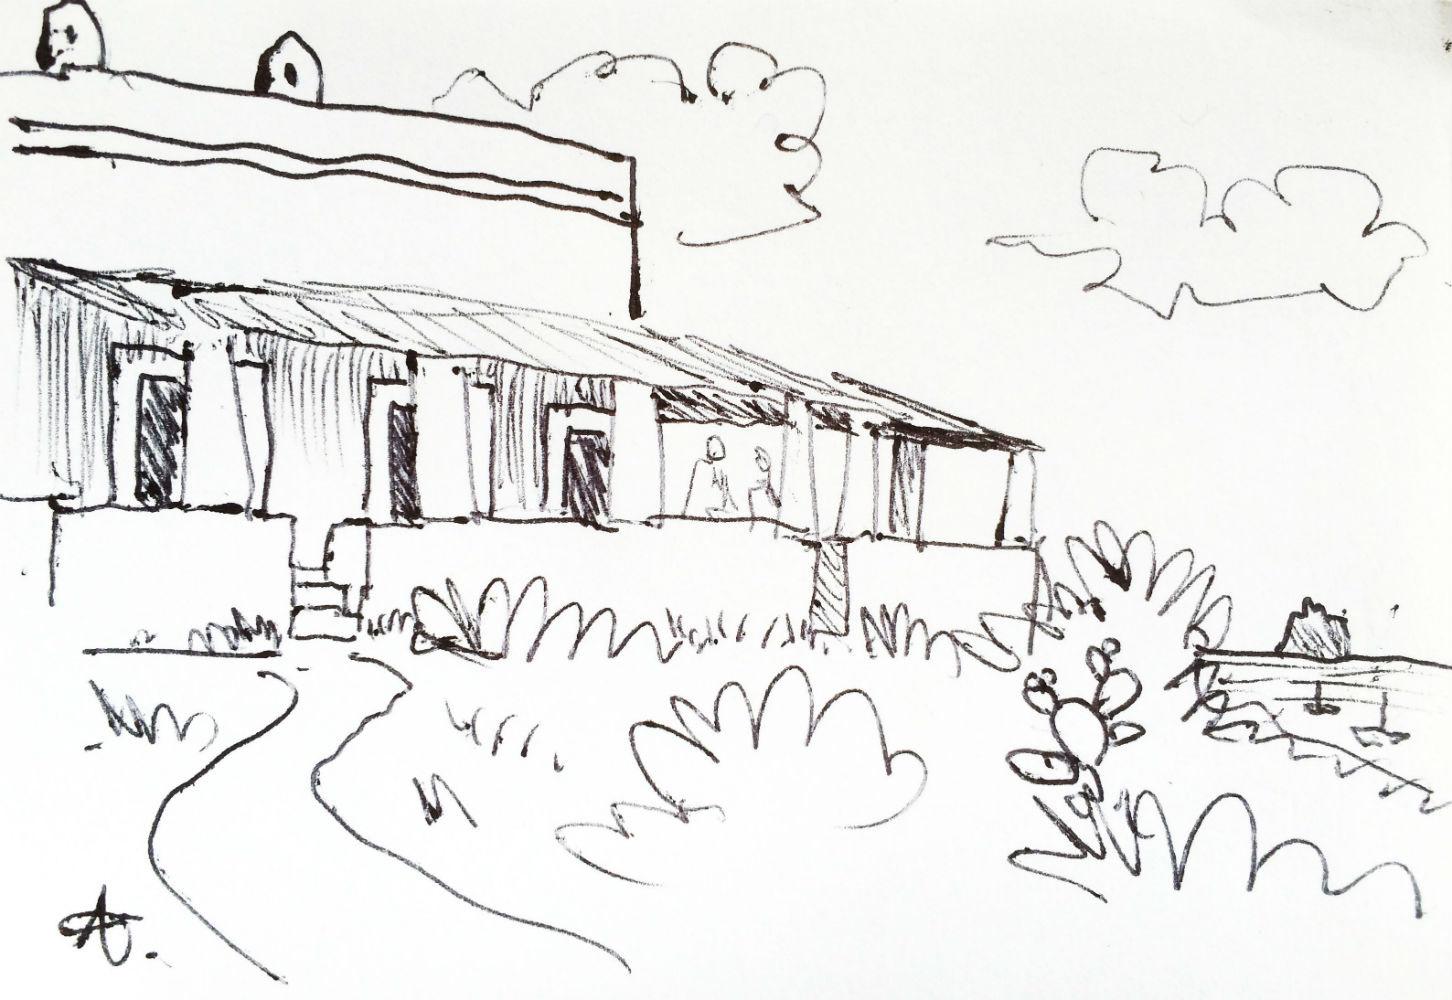 a-sicilian-wedding-by-claudio-assandri-stromboli-house